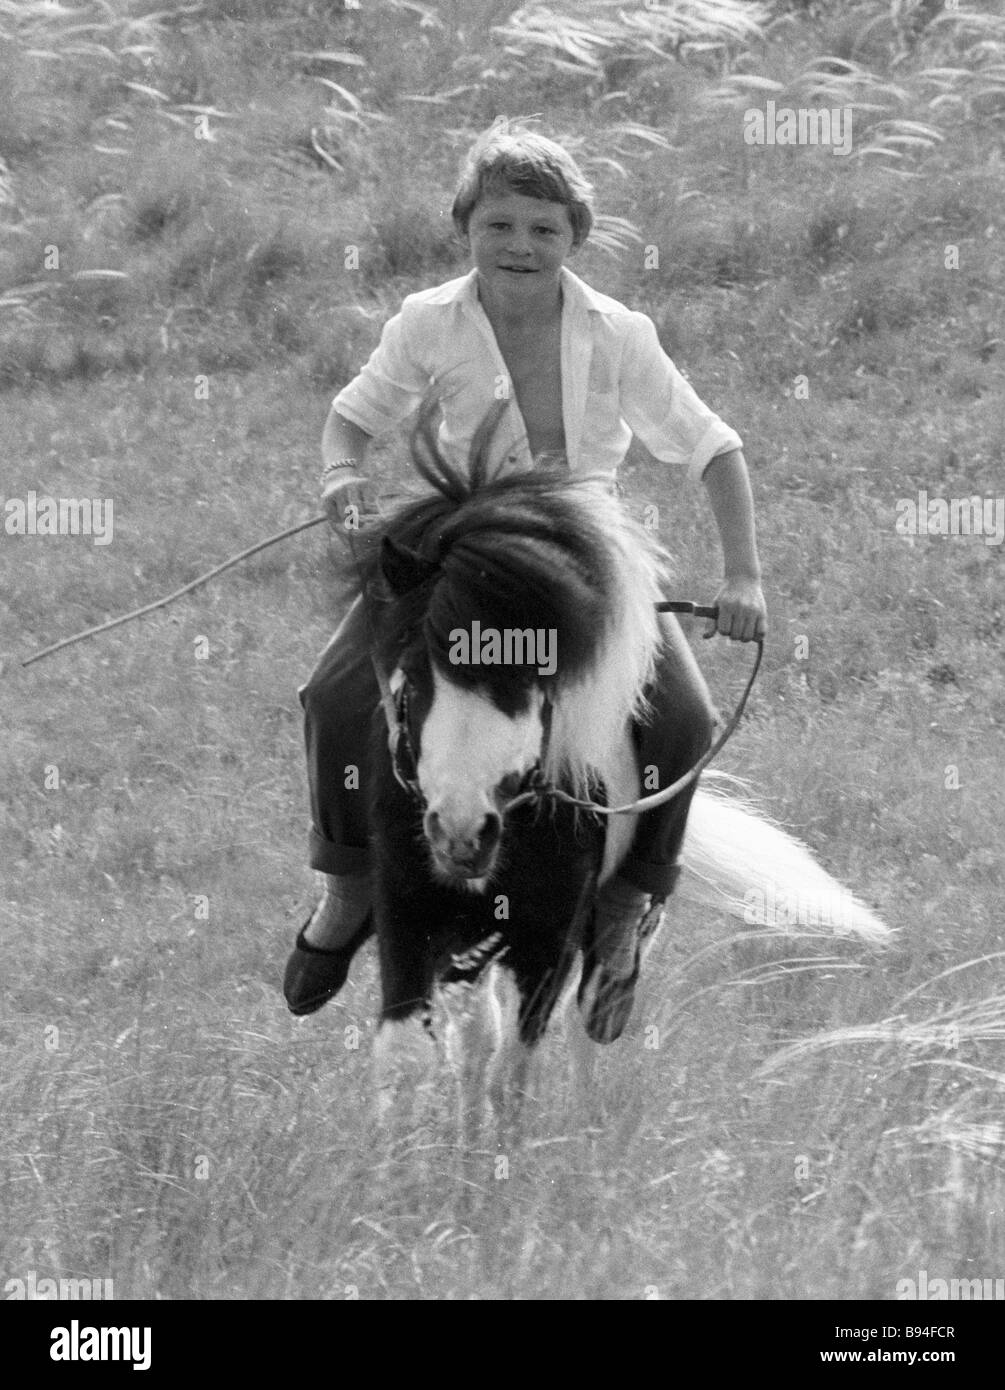 A Bashkir boy breaks in a horse at the Tulpar riding center Stock Photo